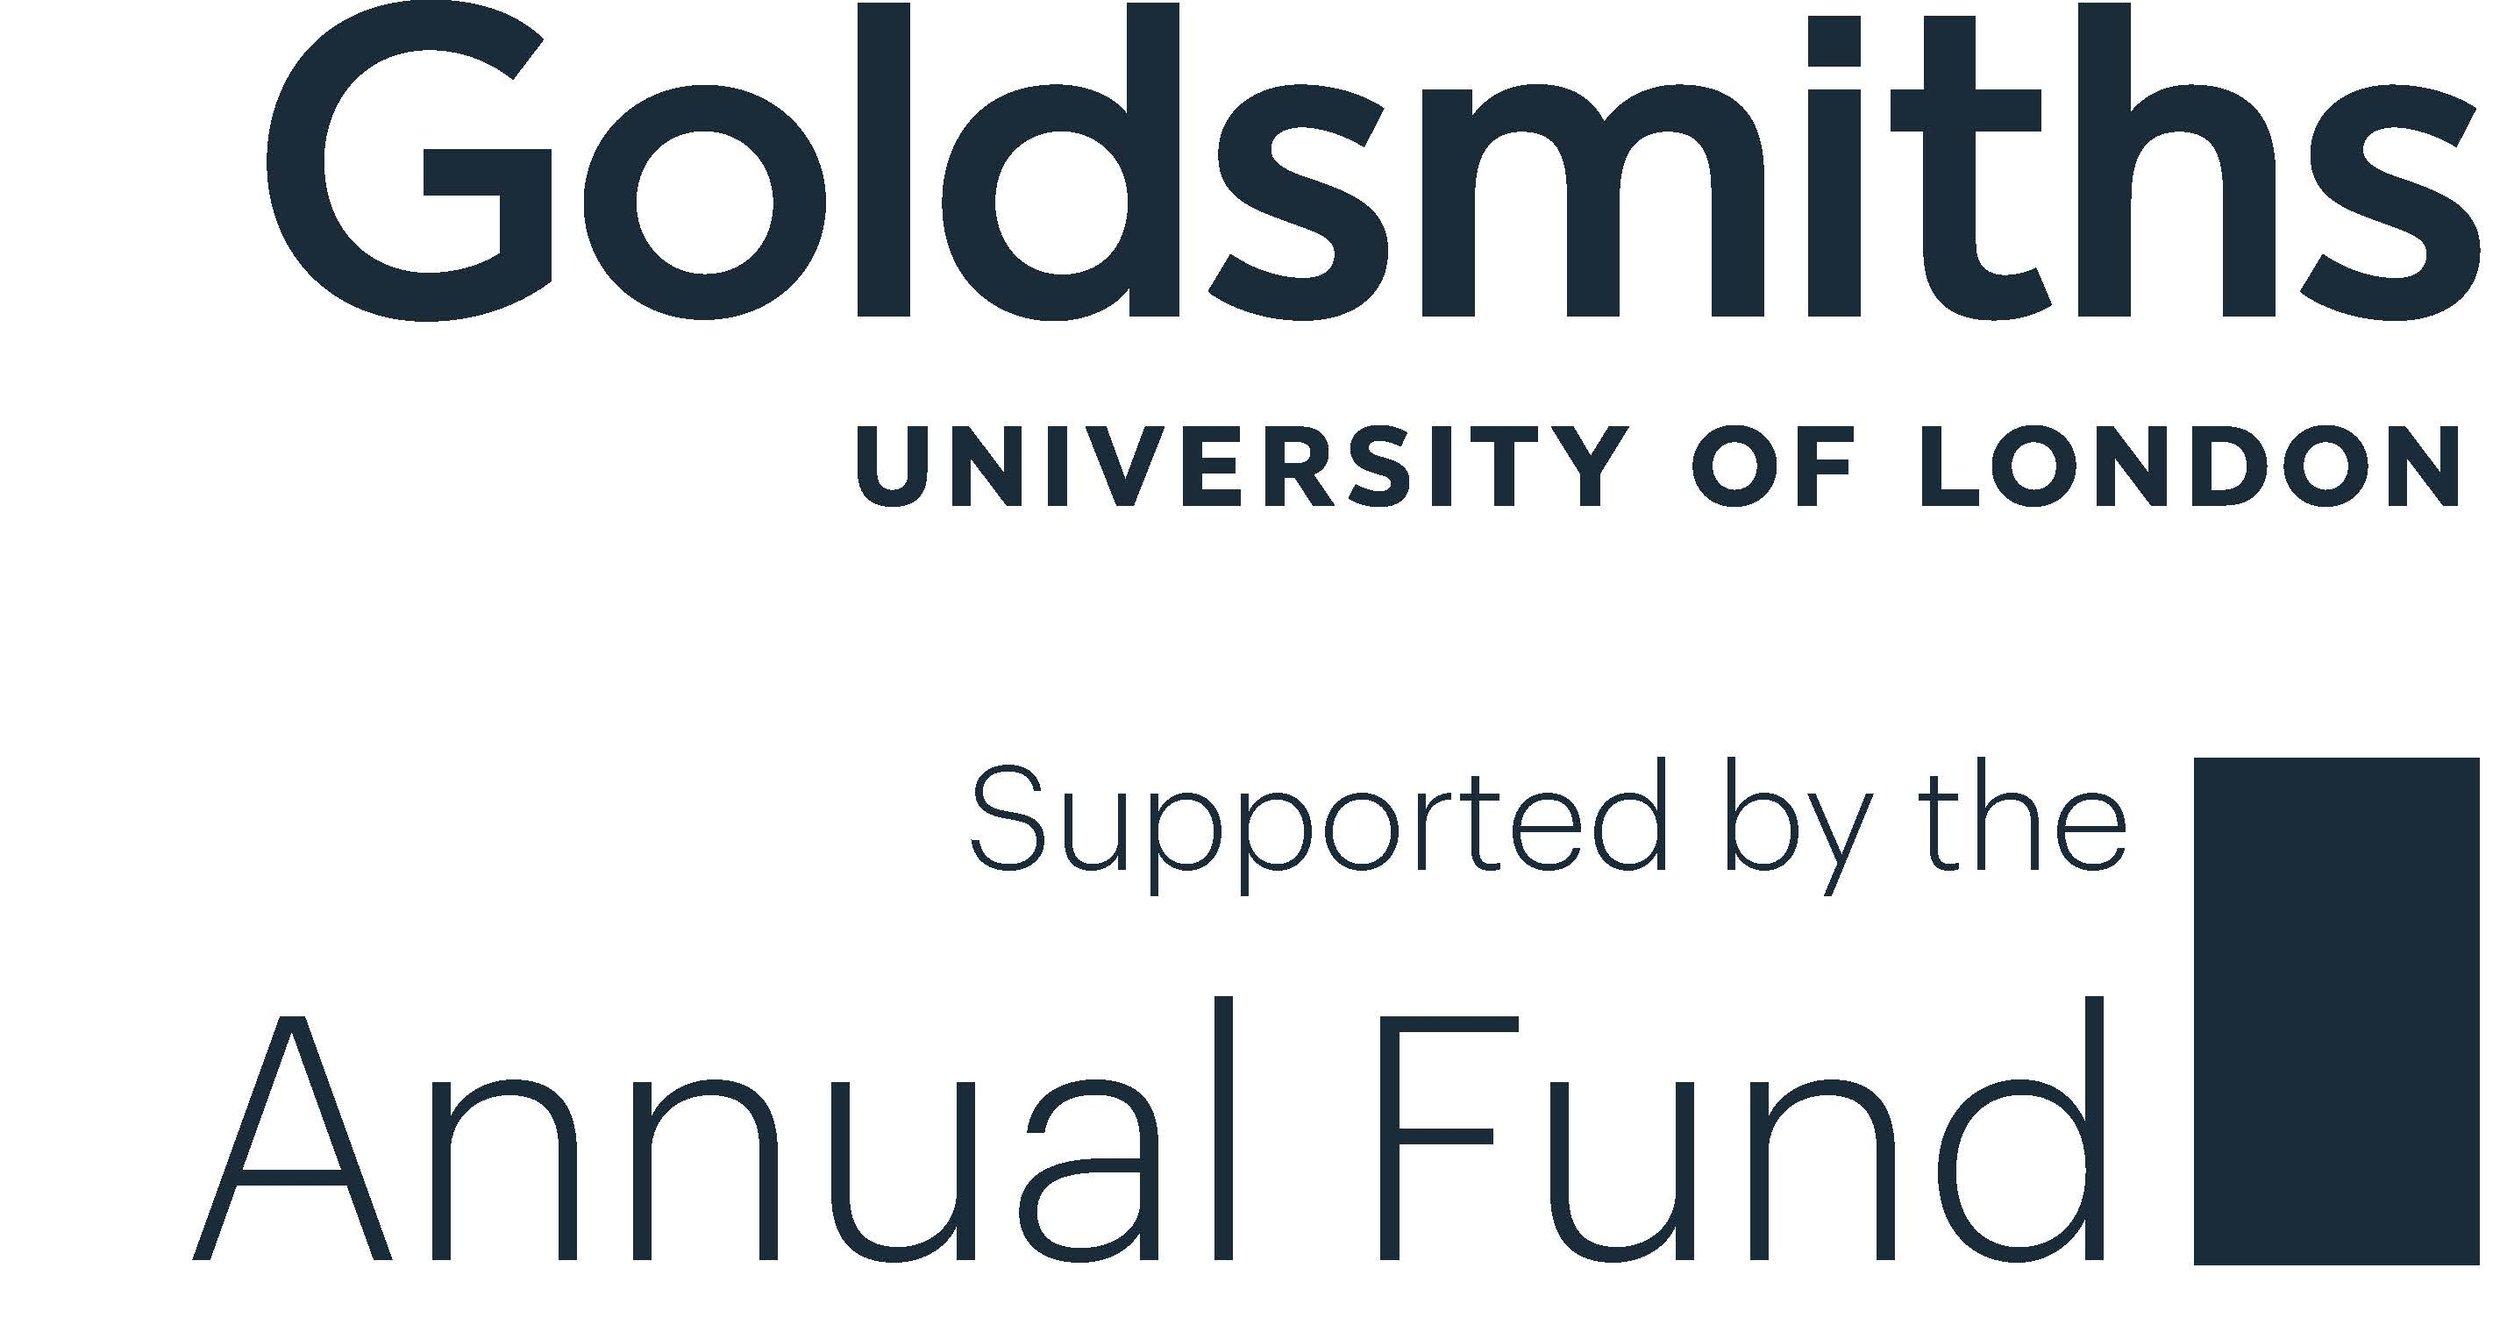 SubBrand_Annual_Fund_Lock-up_Logo_DG.jpg